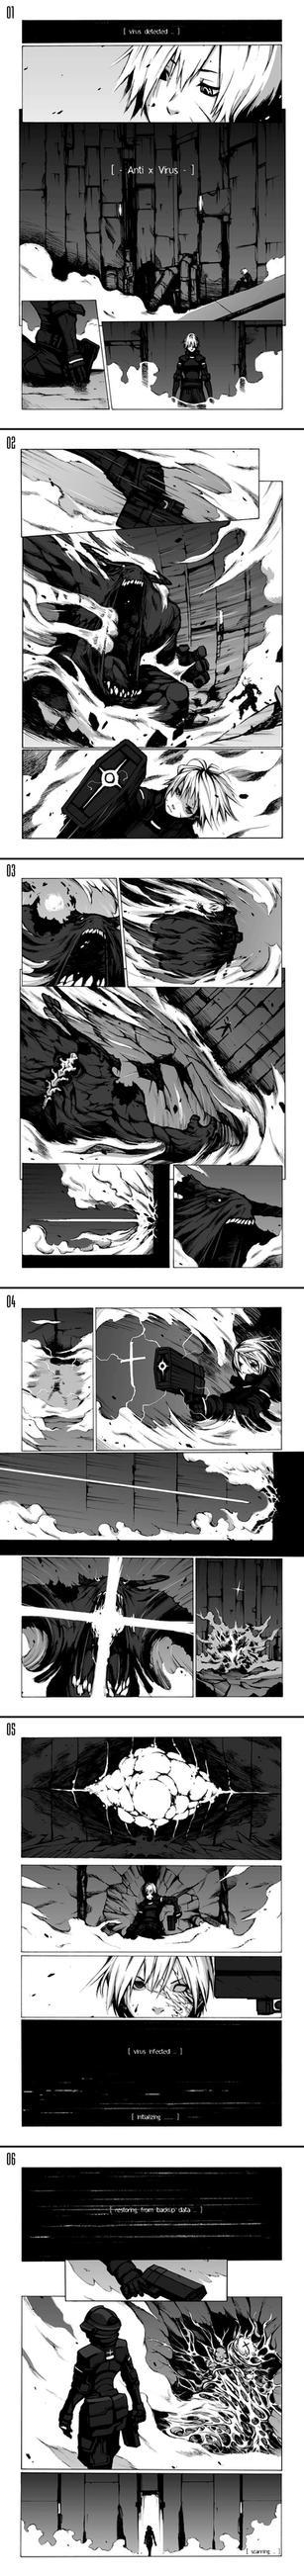 newbie comic - Antivirus by chopstickmadness